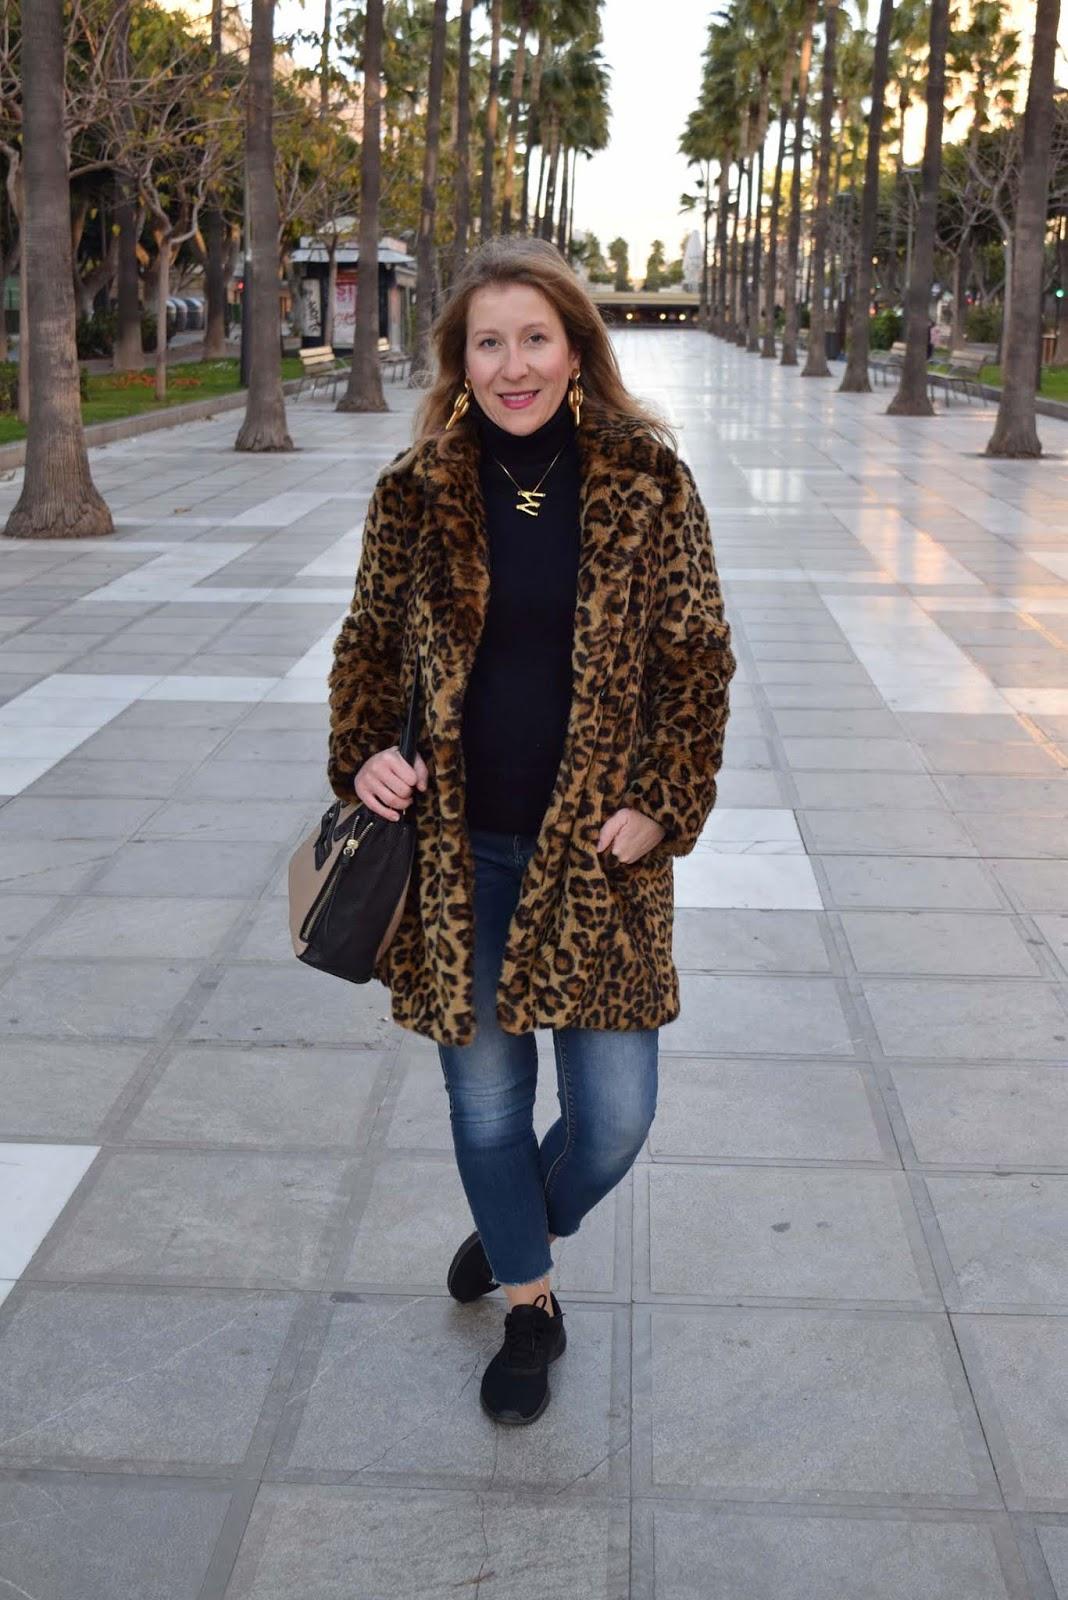 Abrigo_leopardo_con_sneakers